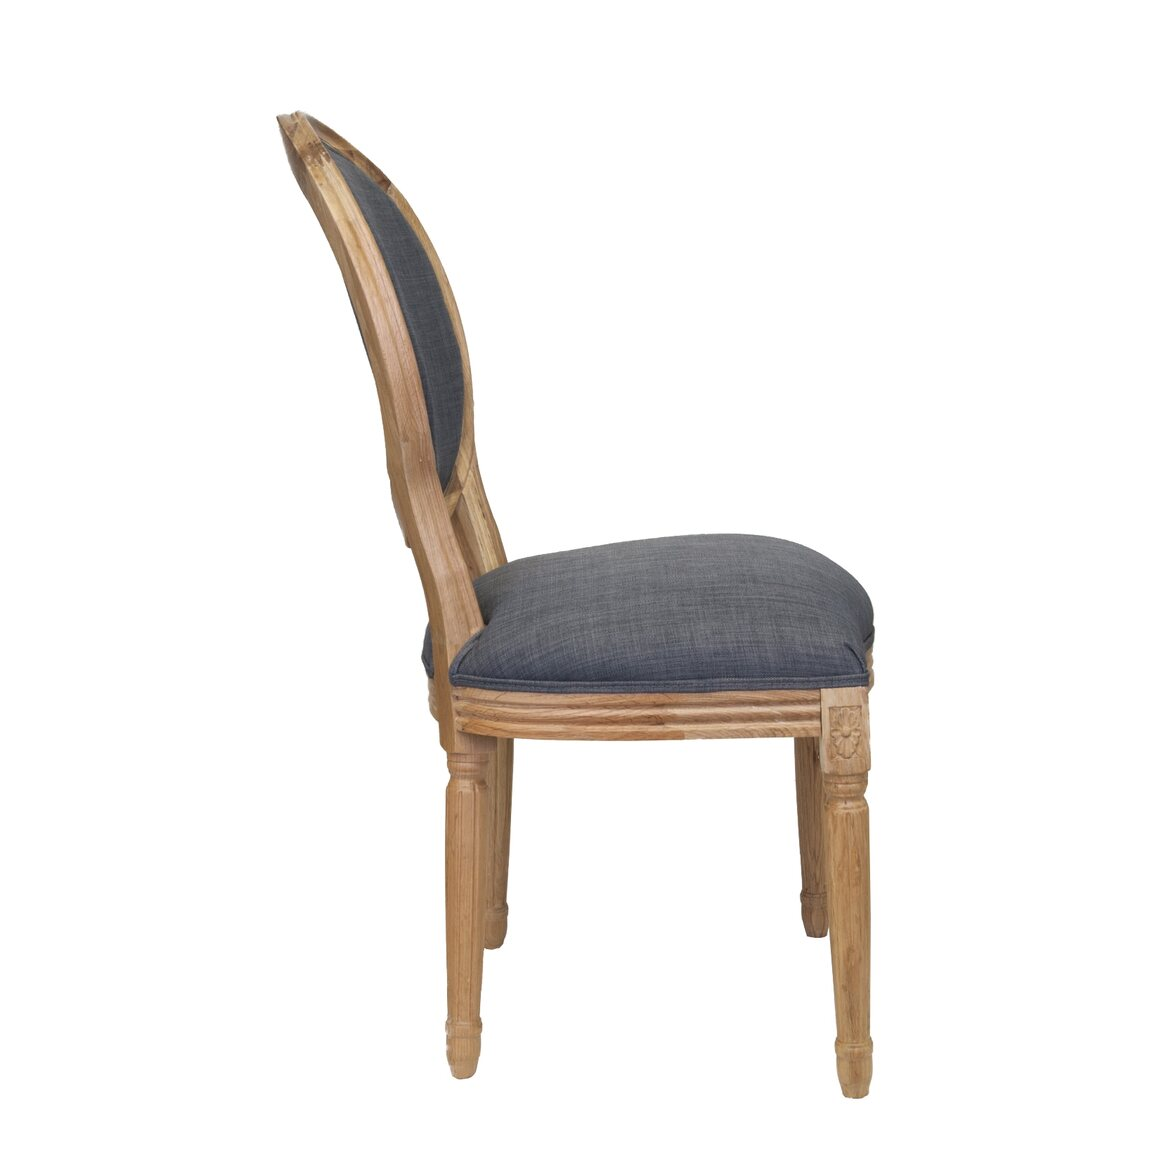 Стул Miro grey 2 | Обеденные стулья Kingsby